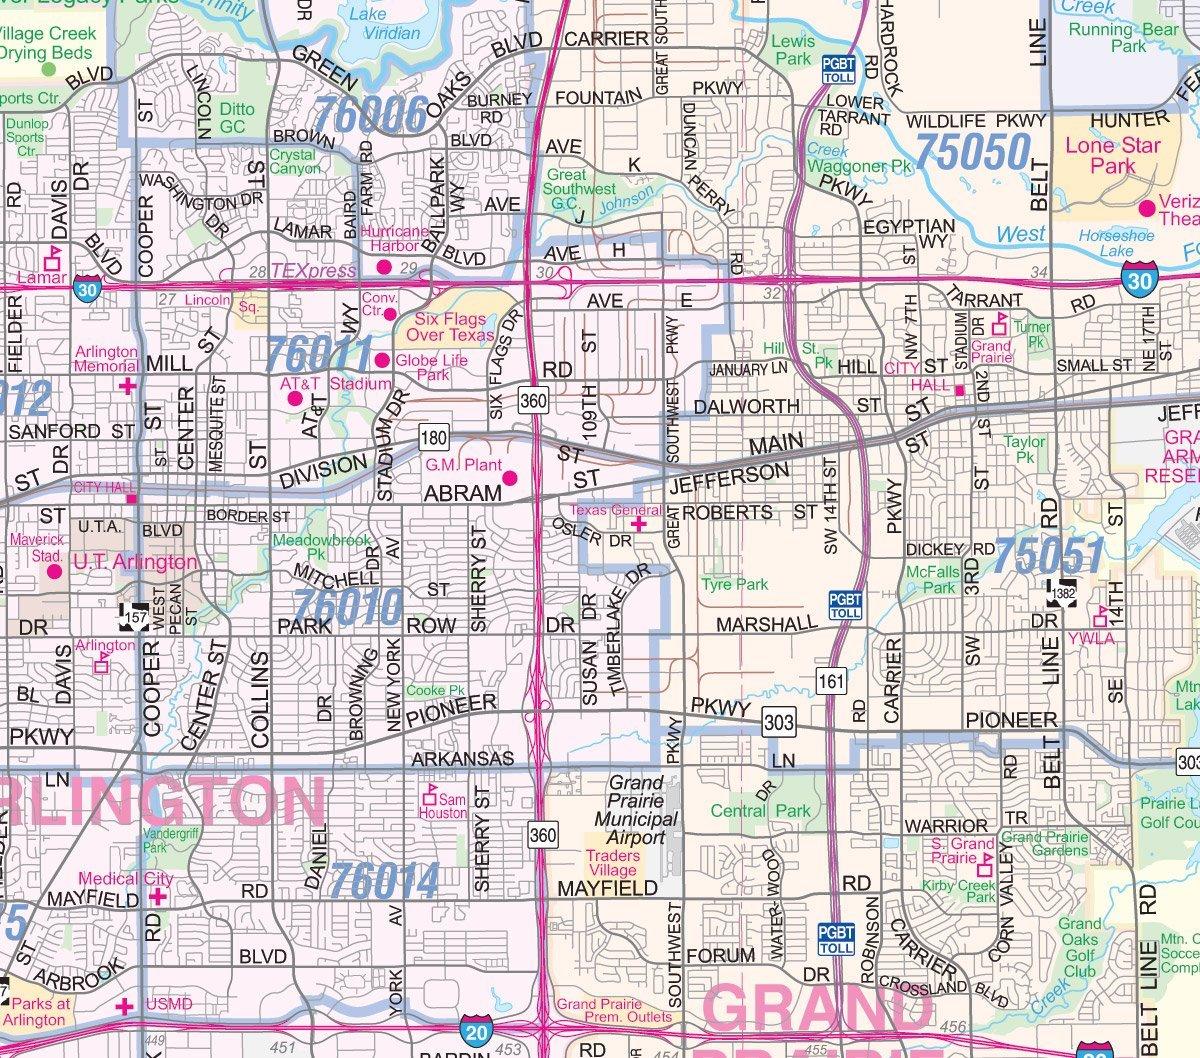 Dfw Area Zip Code Map.Dallas Fort Worth Metroplex Detailed Region Wall Map W Zip Codes